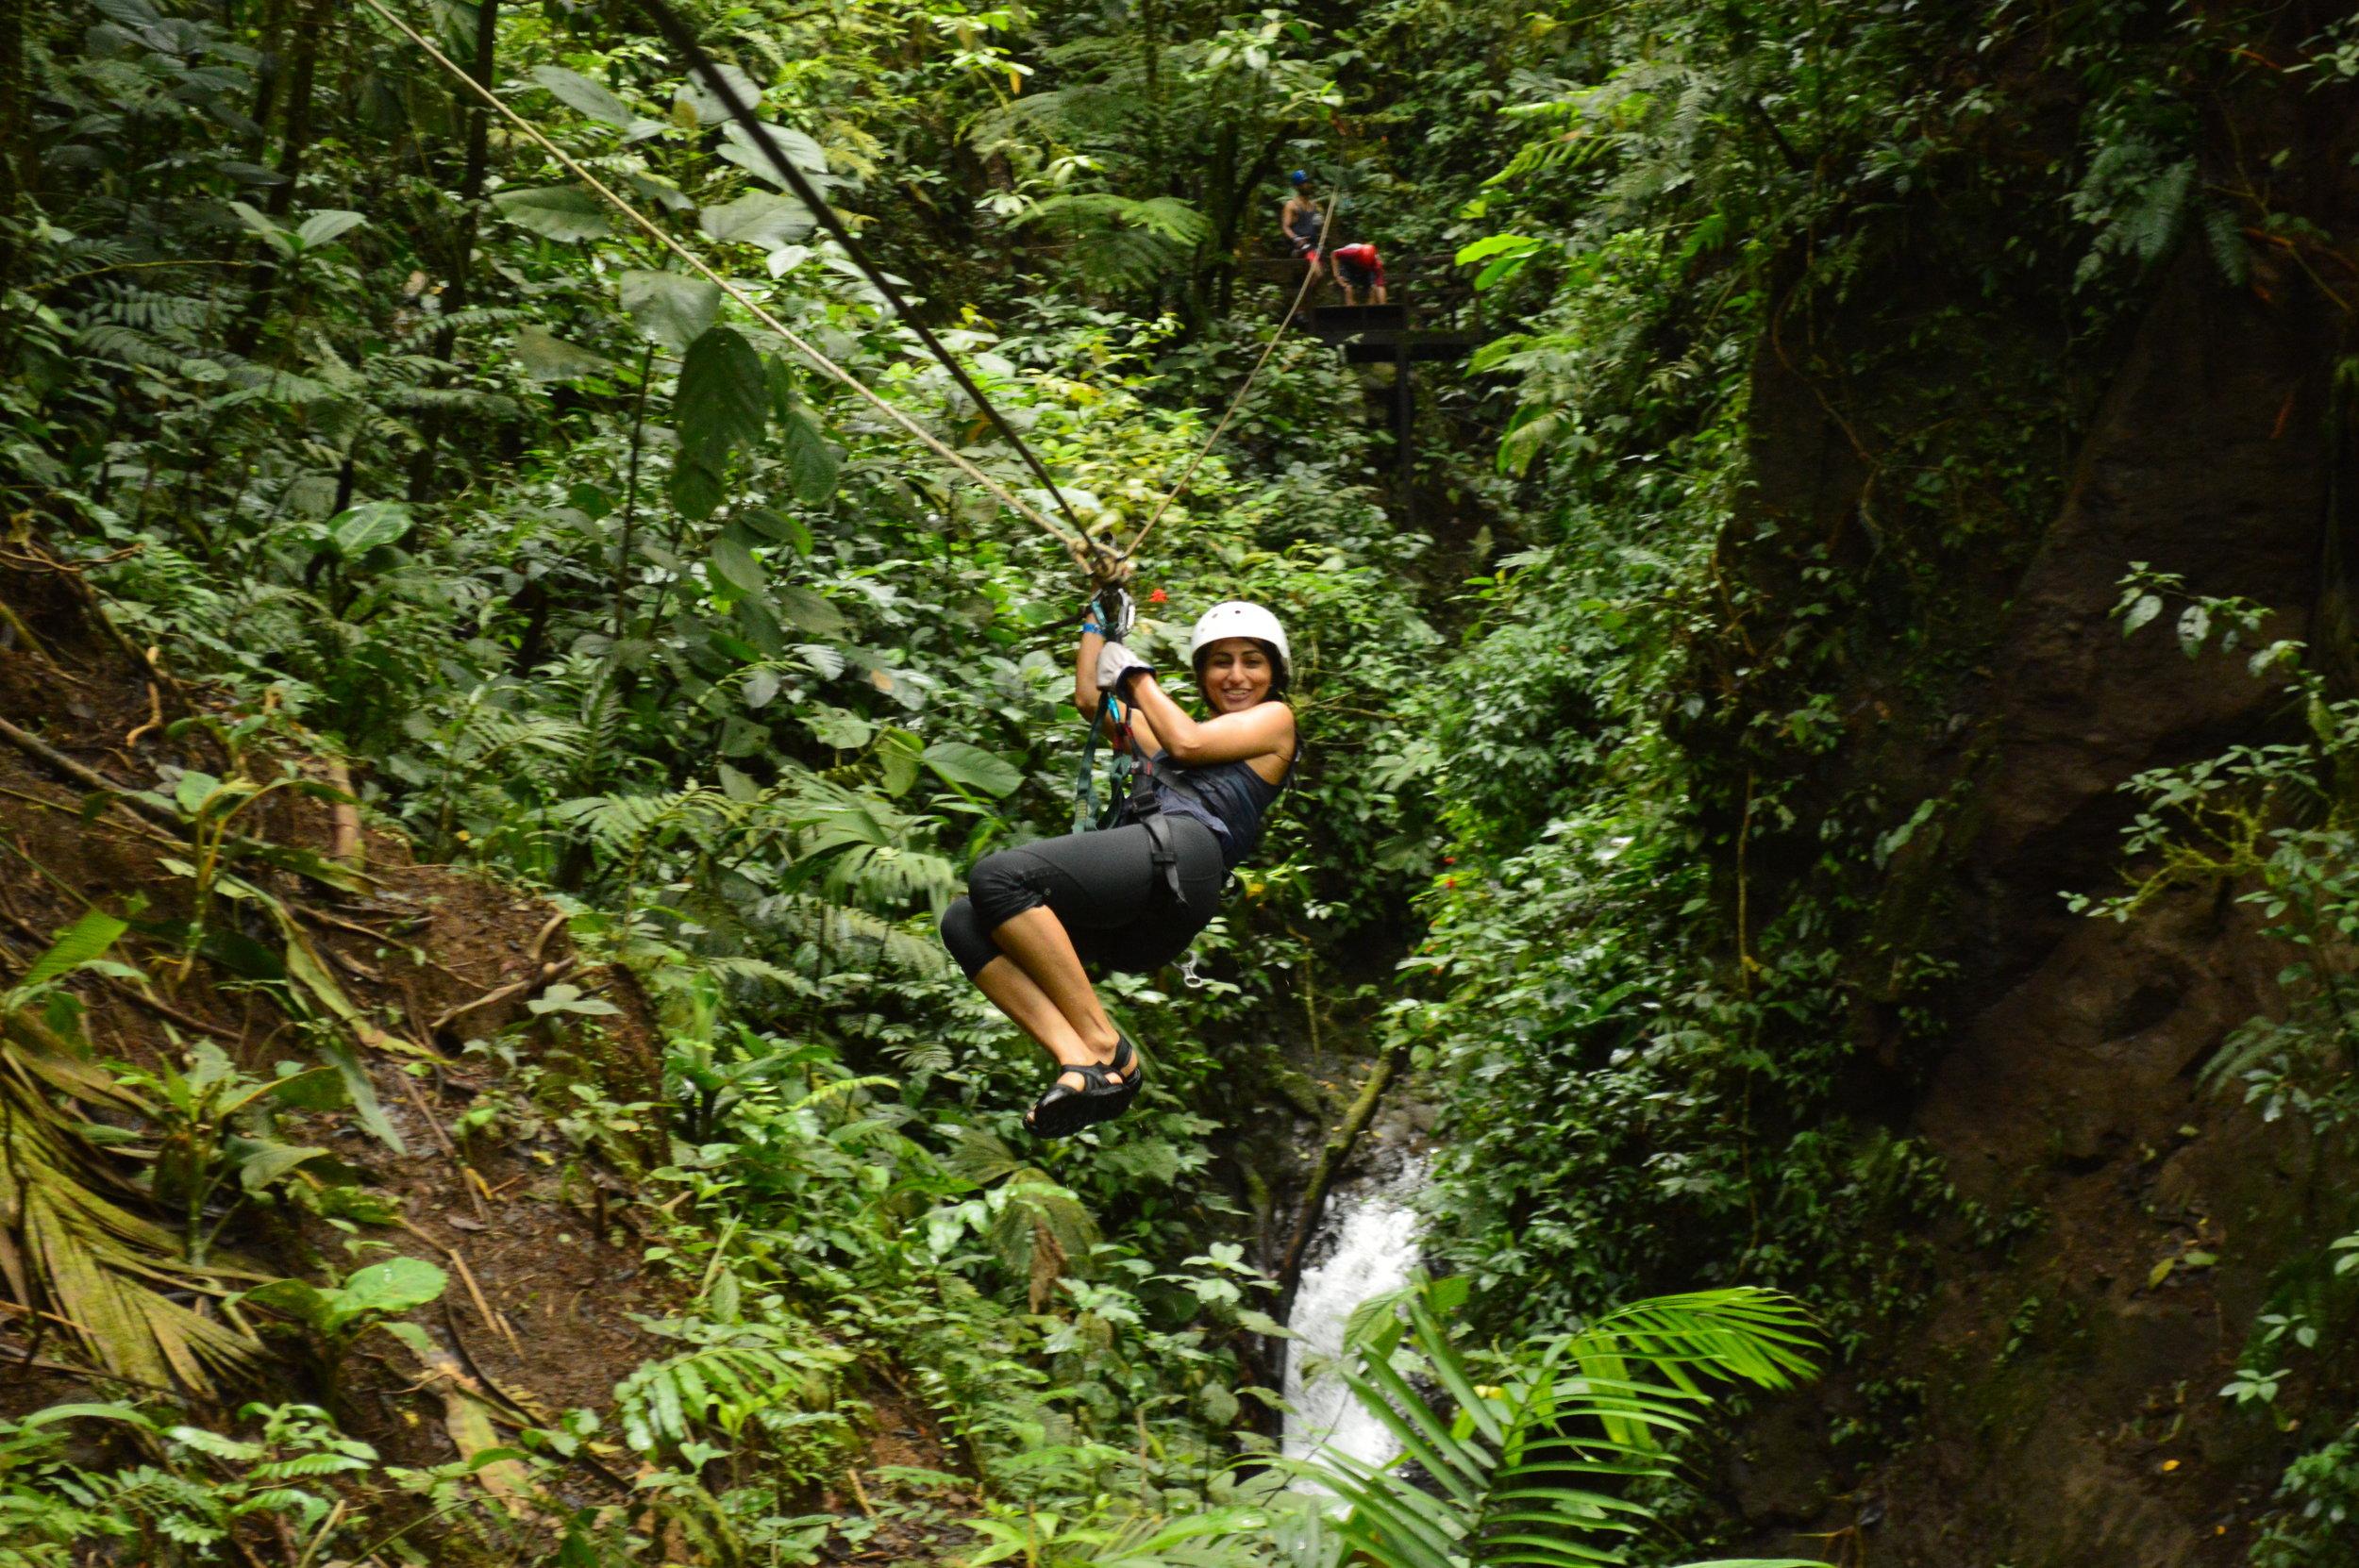 R: More ziplining!